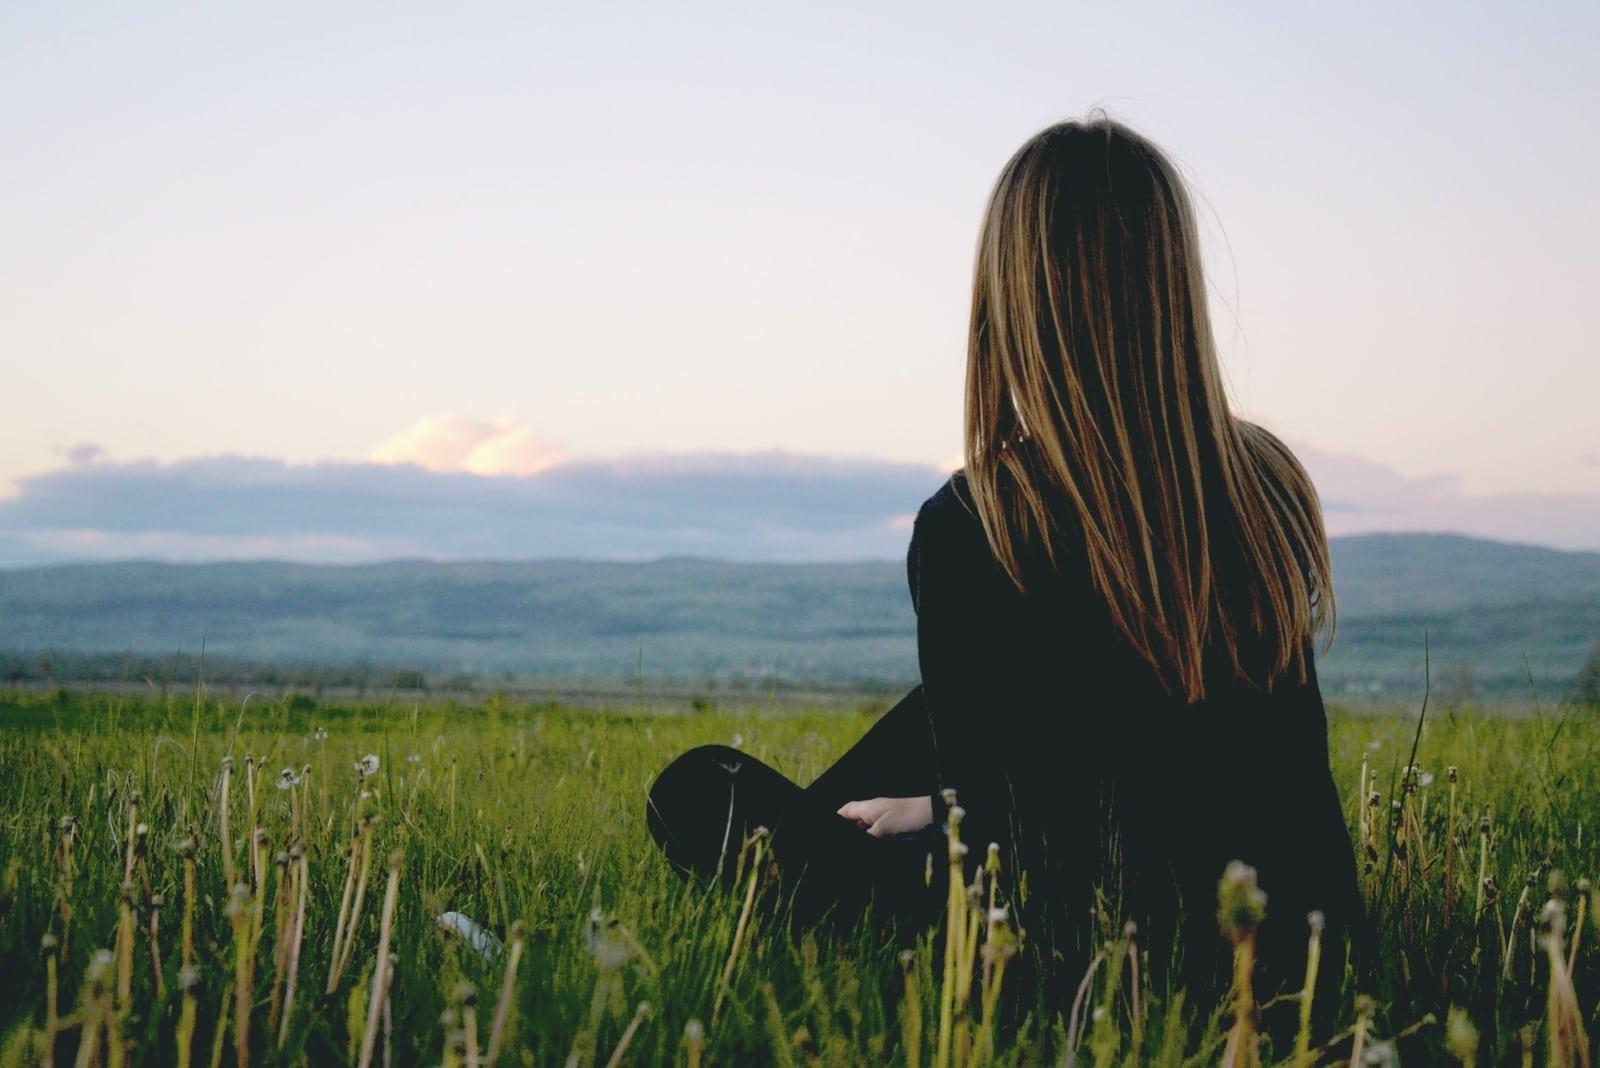 woman in black shirt sitting on grass